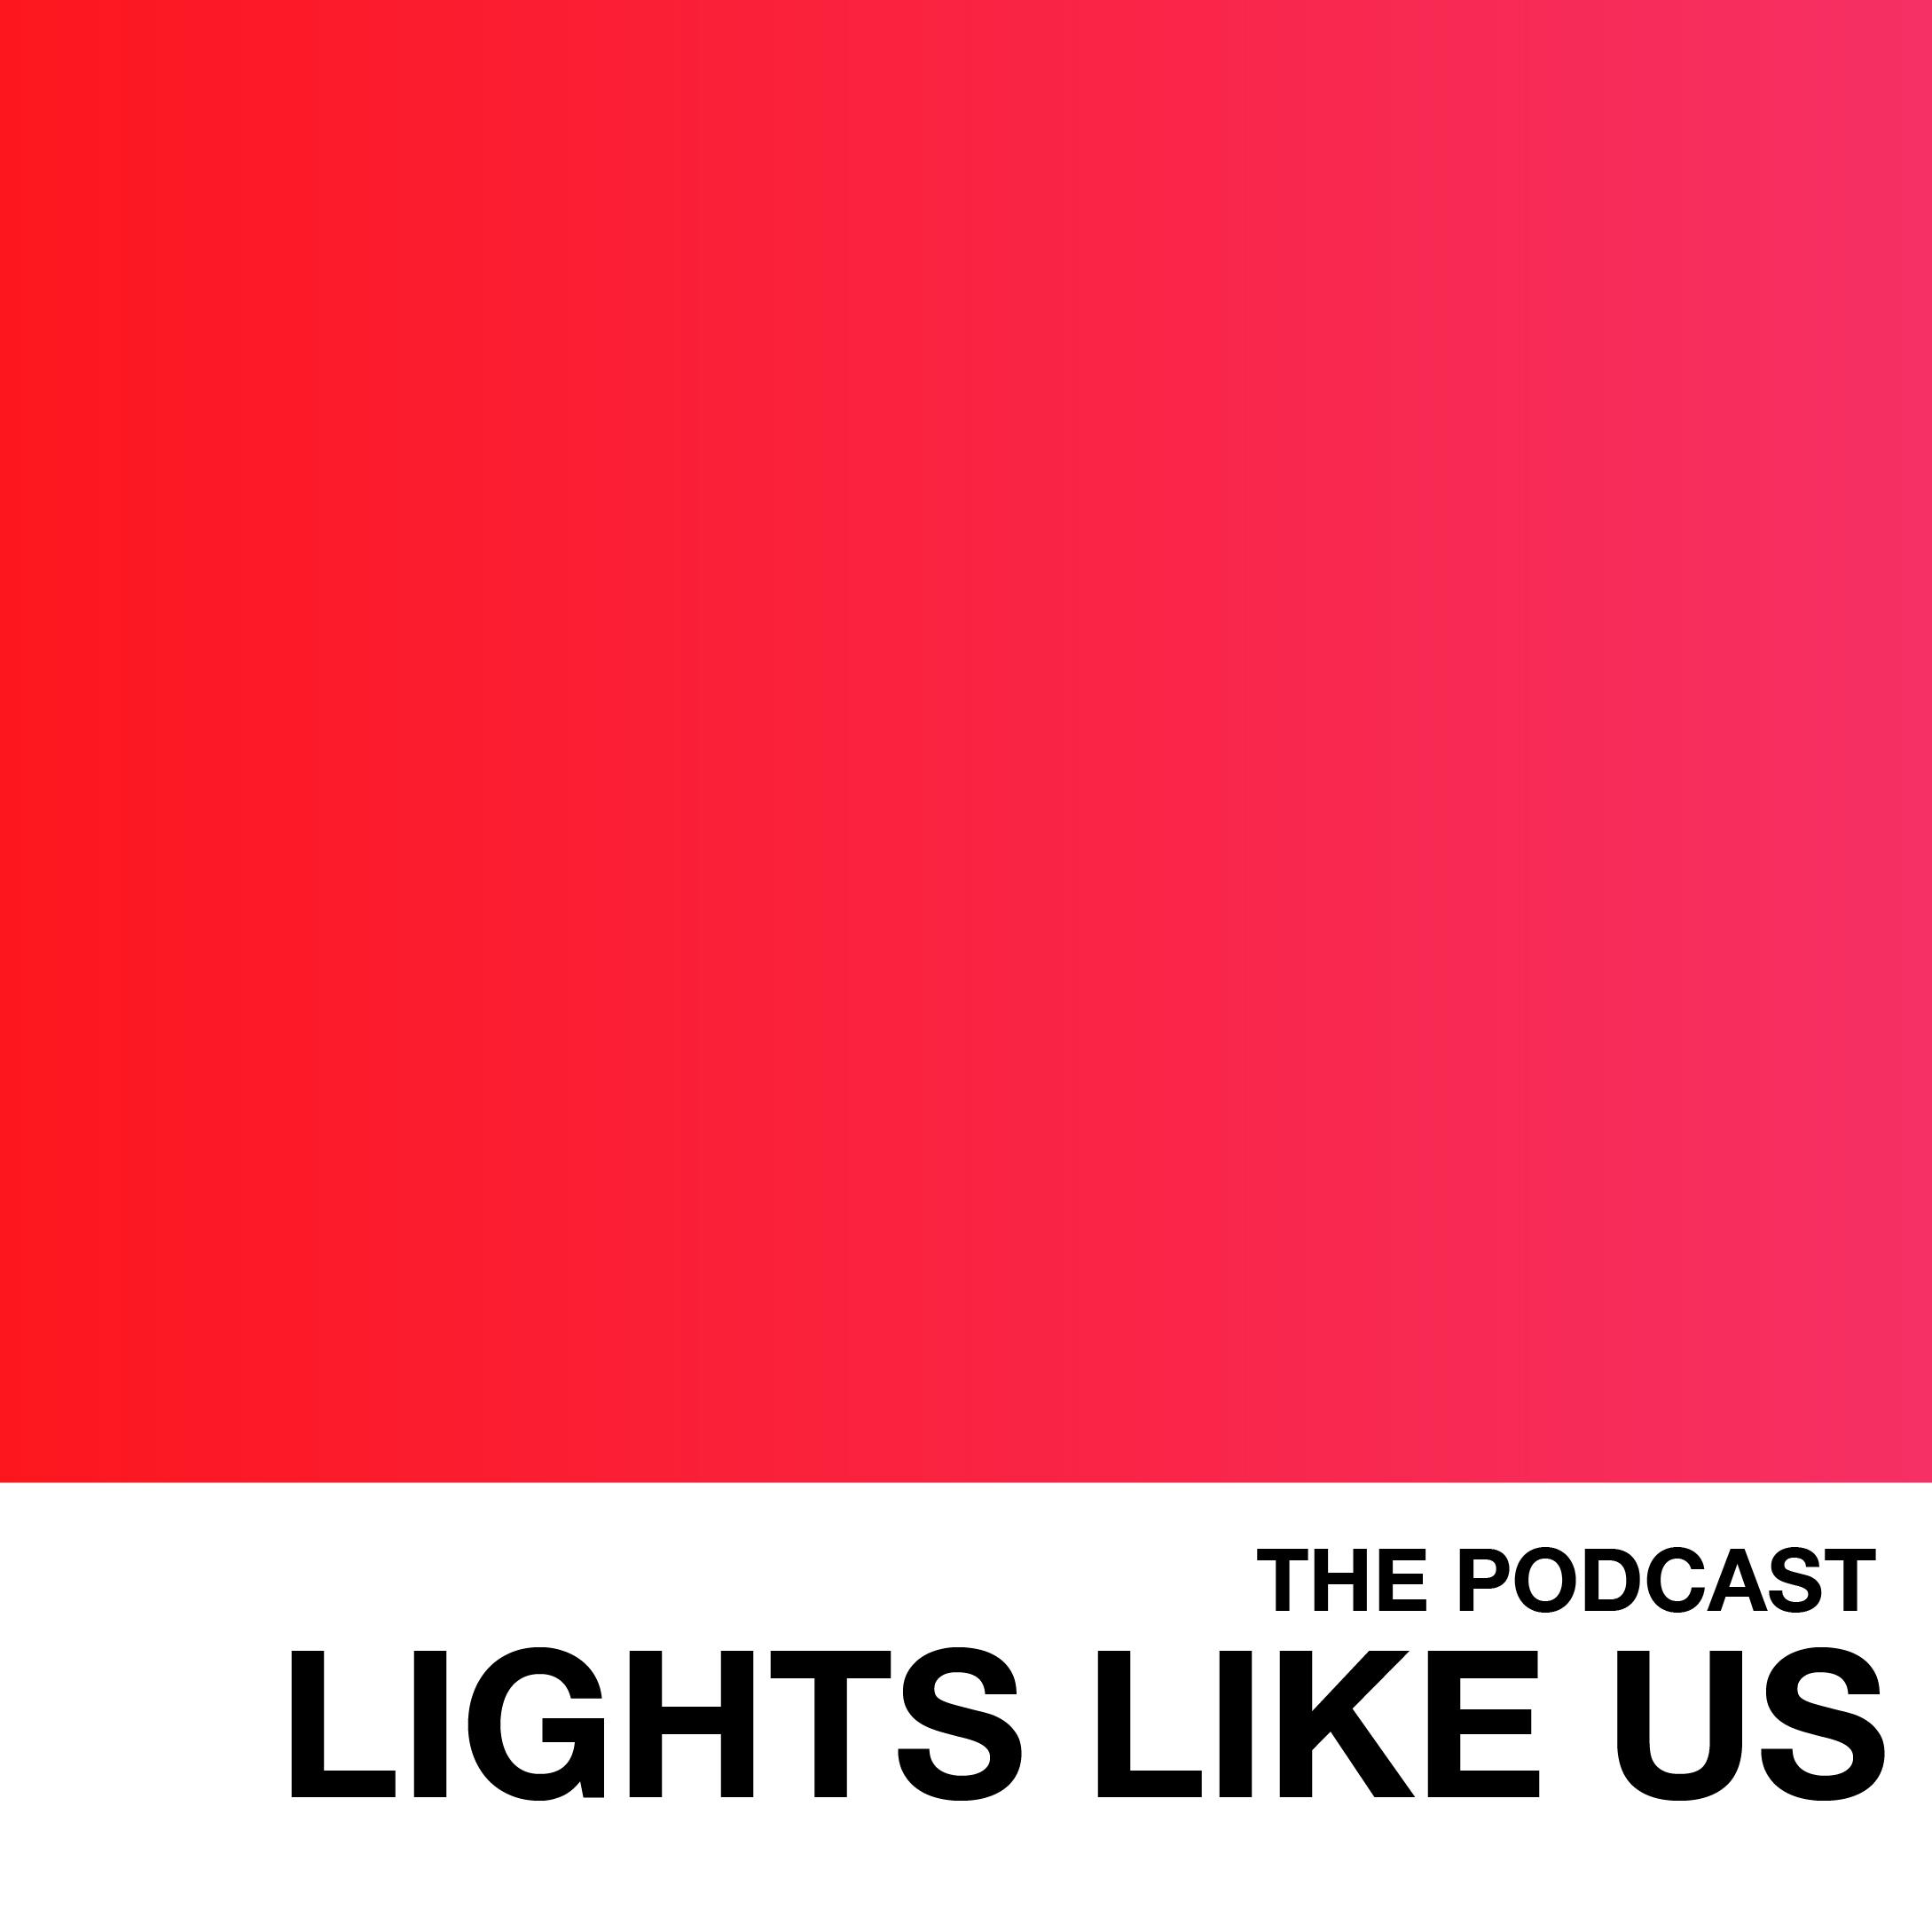 lightslikepodcast.jpg